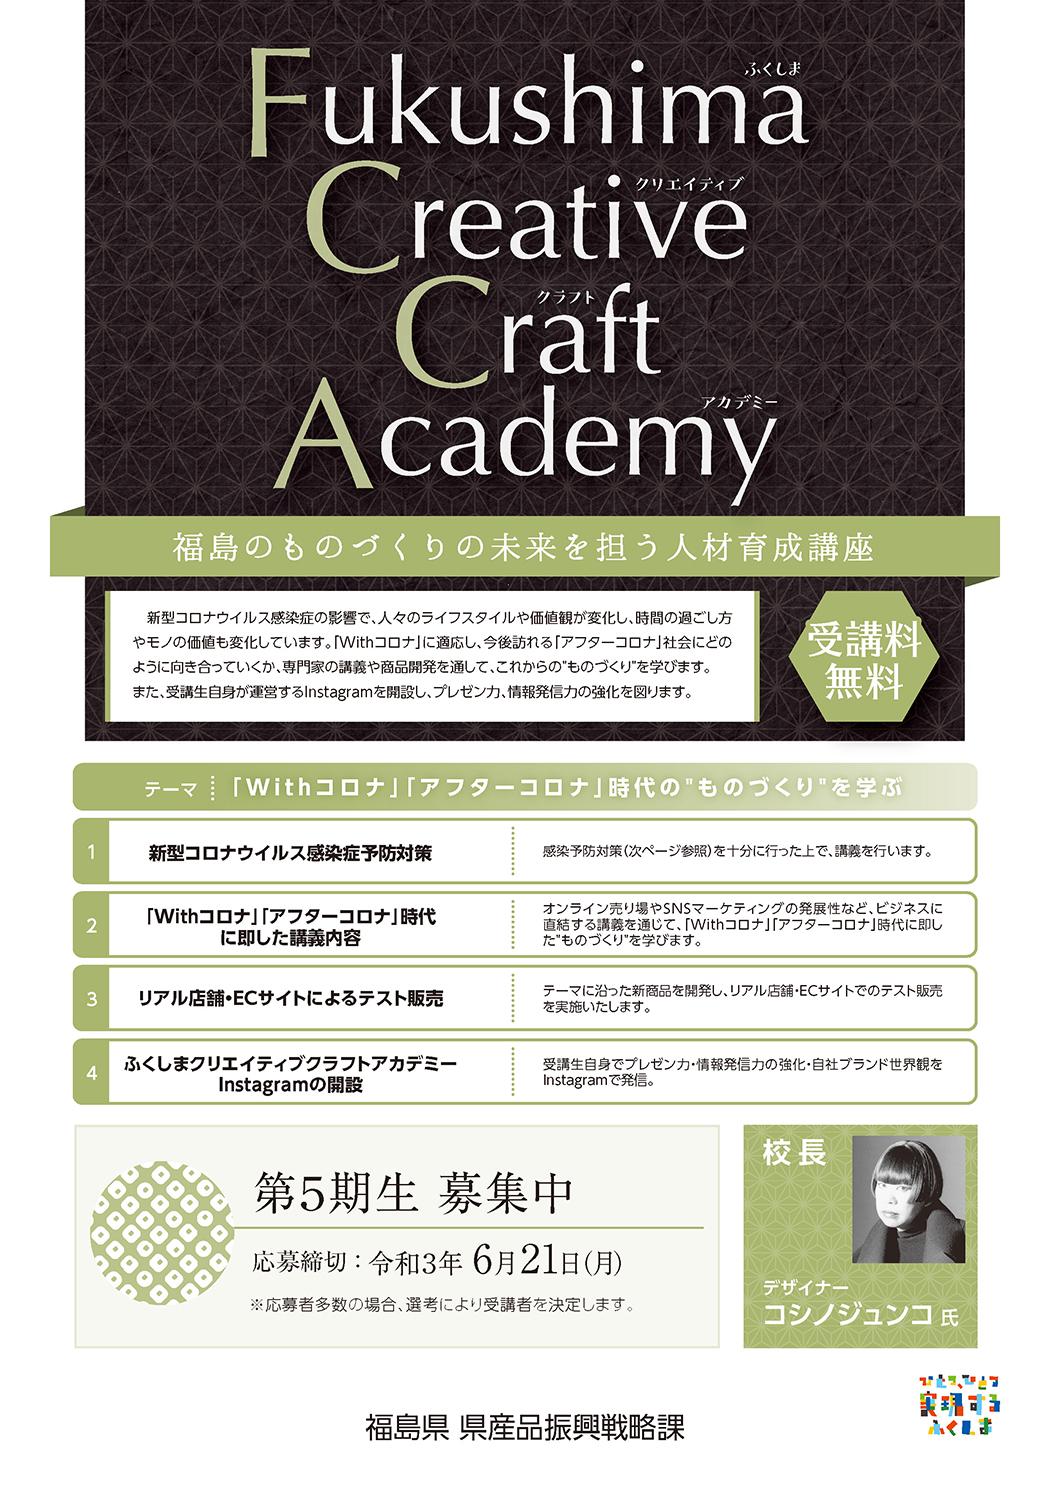 Fukushima Creative Craft Academy 福島のものづくりの未来を担う人材育成講座 第5期生募集中